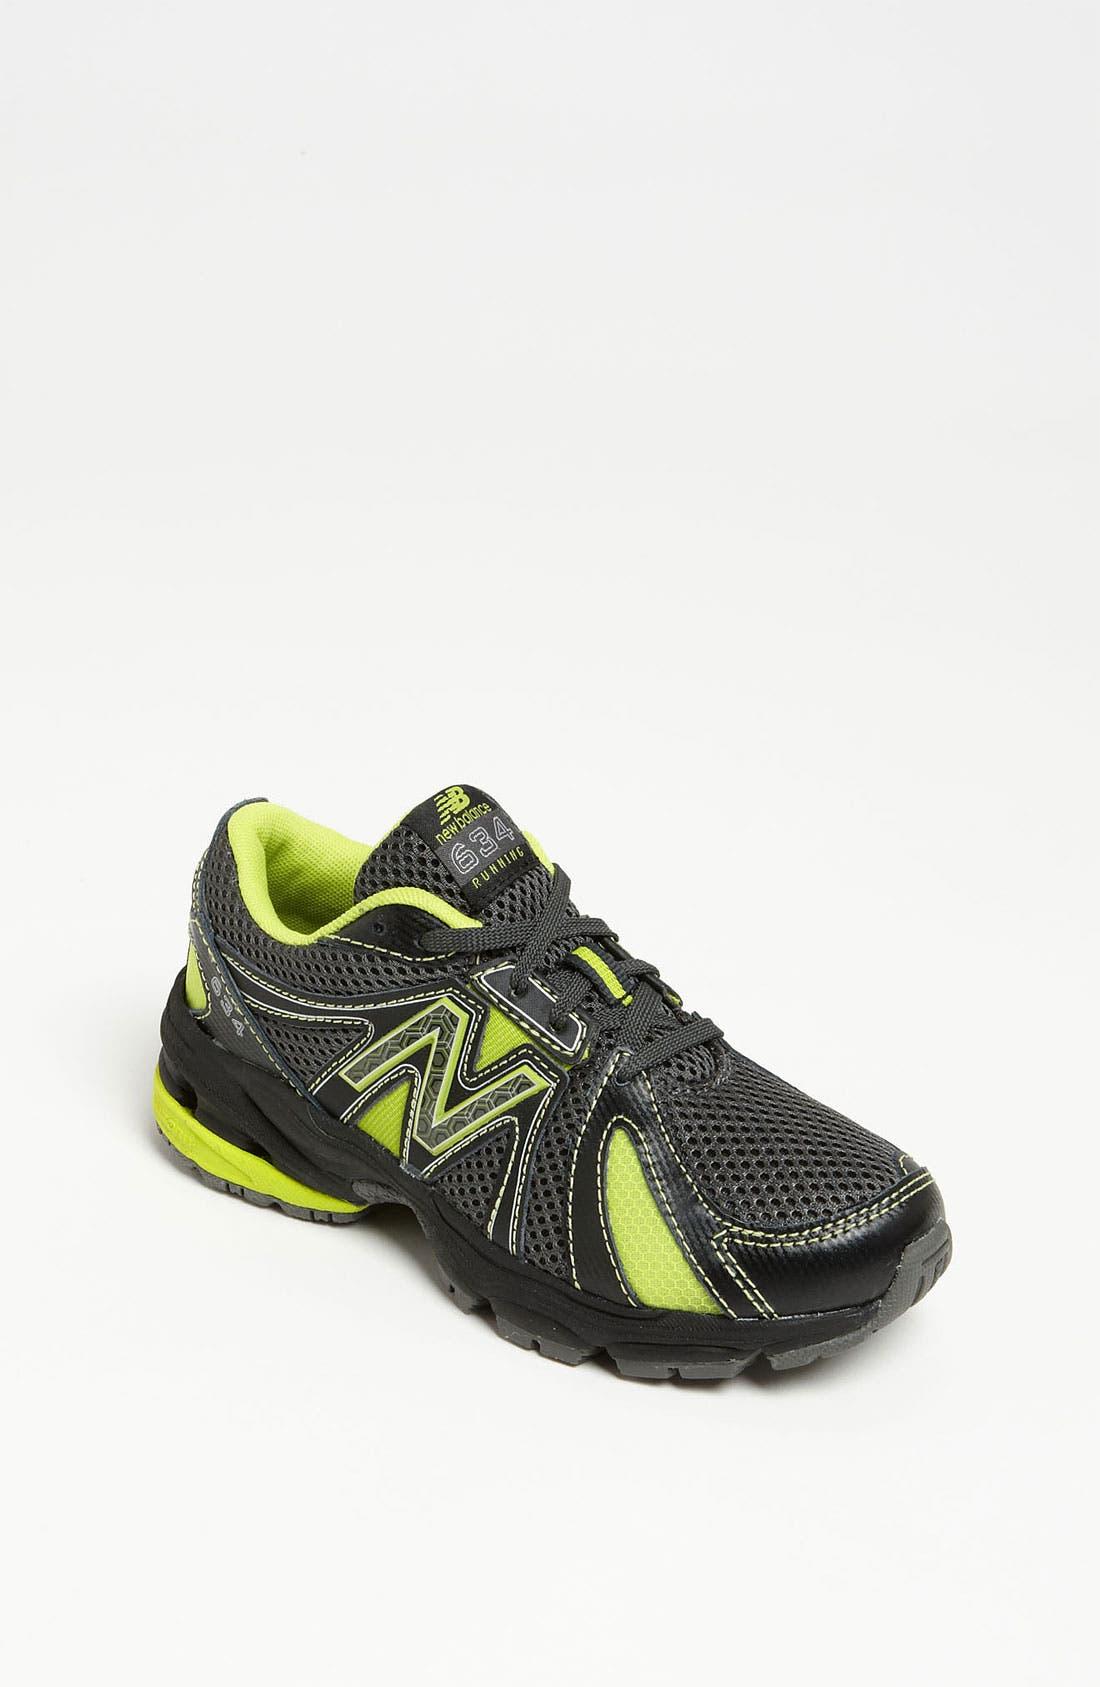 Main Image - New Balance '634' Running Shoe (Toddler, Little Kid & Big Kid)